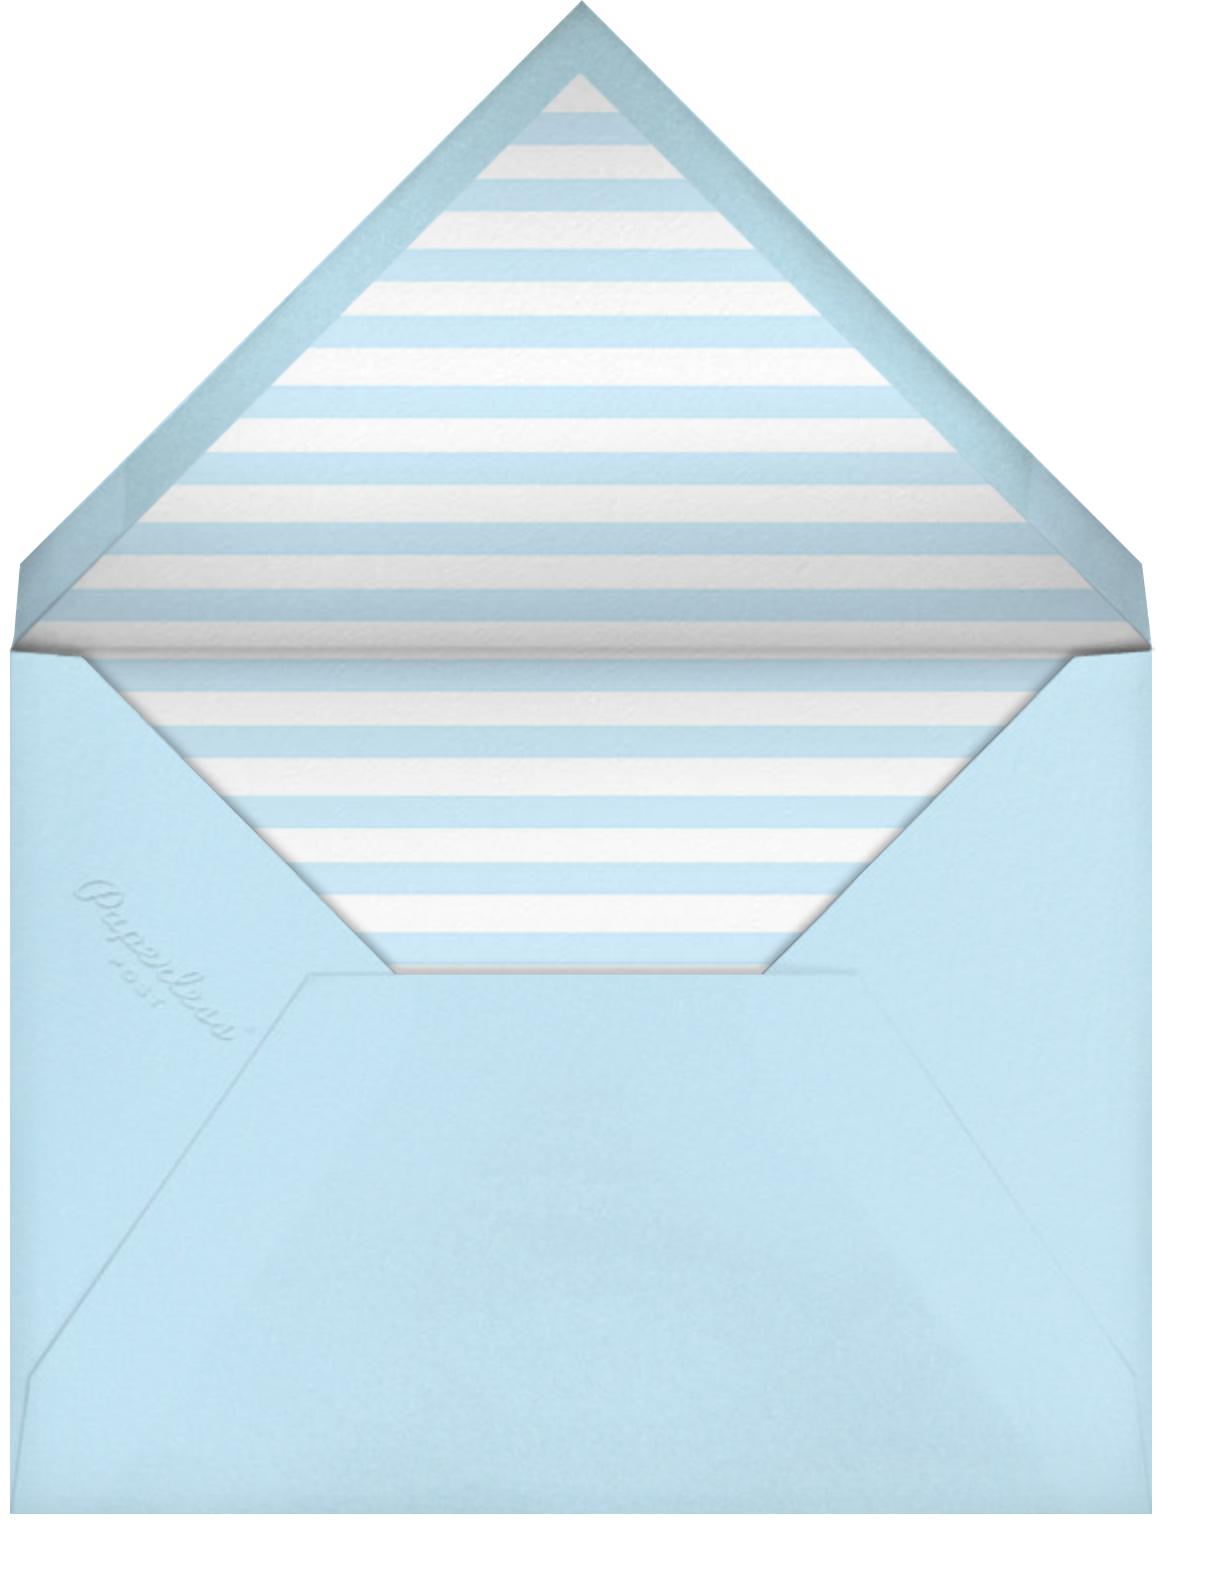 Mr. Digby (Invitation) - Mr. Boddington's Studio - Envelope